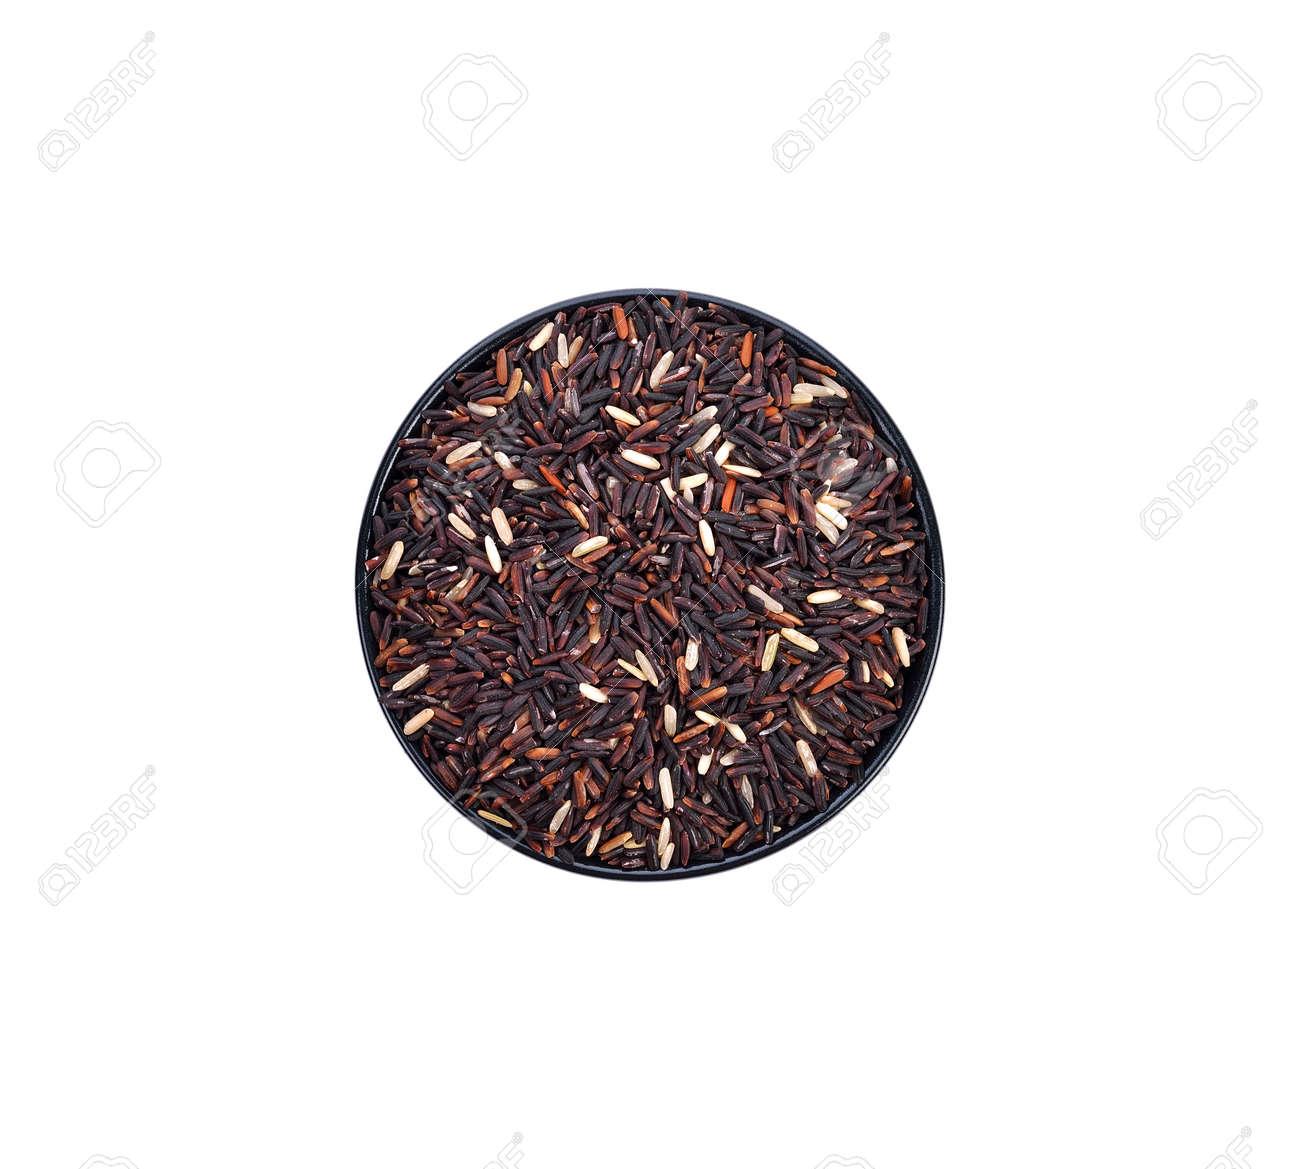 rice berry organic rice on white background - 169847325